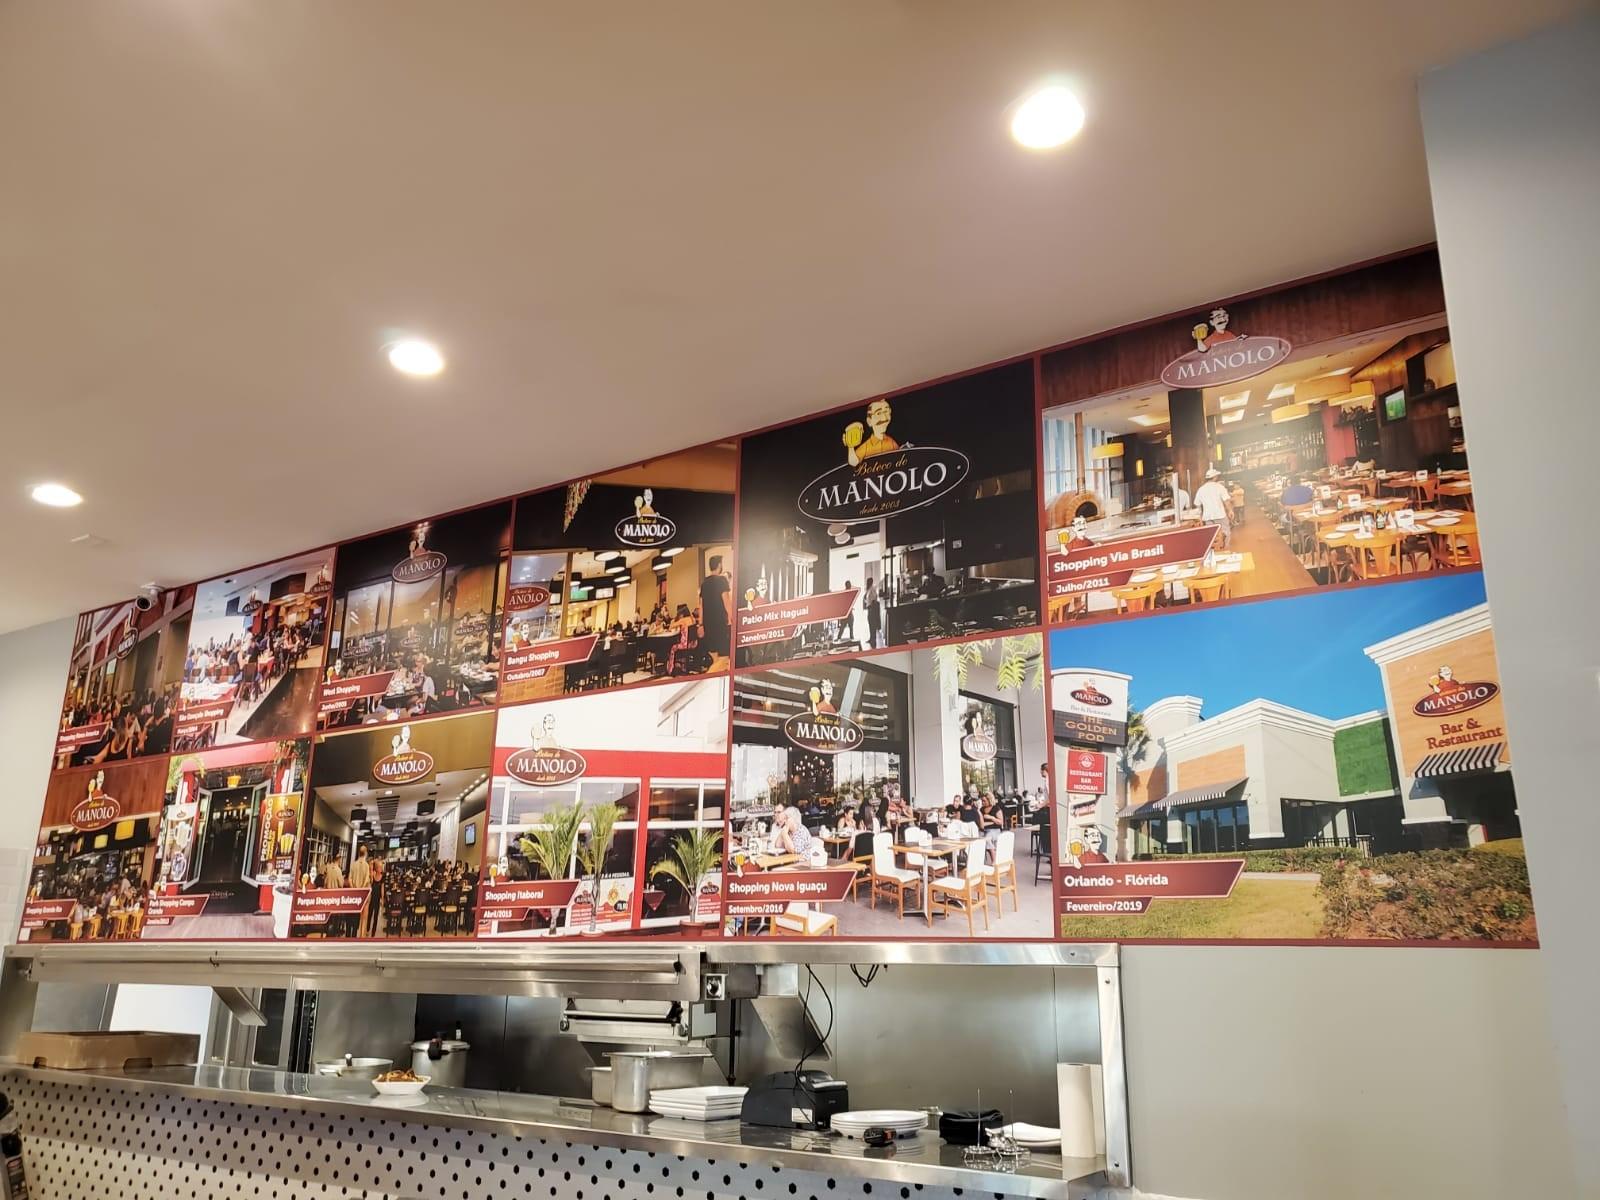 Wall Graphics, Murals, Wallpaper | Interior Signage & Indoor Signs | Restaurant and Food Service Signs | Orlando, Florida | Manolo | Restaurante | Brazilian Food | Fastsigns | Signage | Wallpaper | Vinyllovers